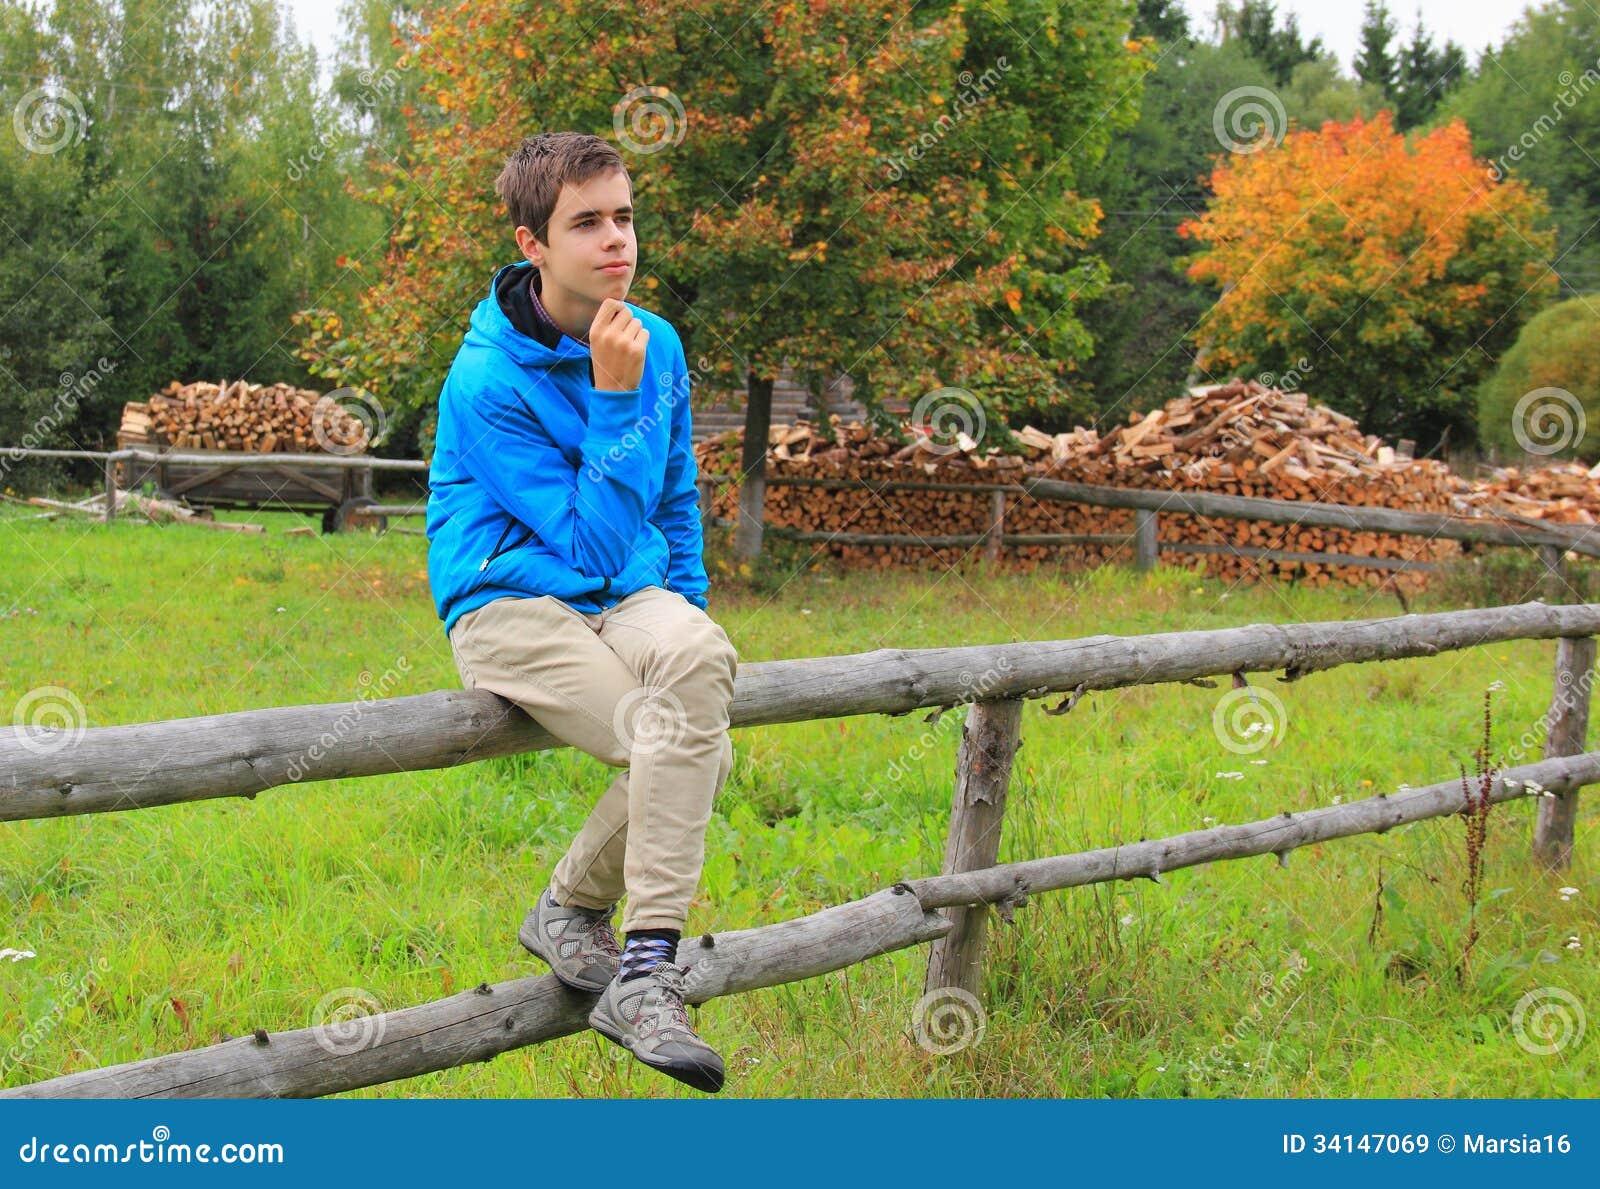 Teenage Boy Sitting On A Fence Royalty Free Stock Images - Image: 34147069